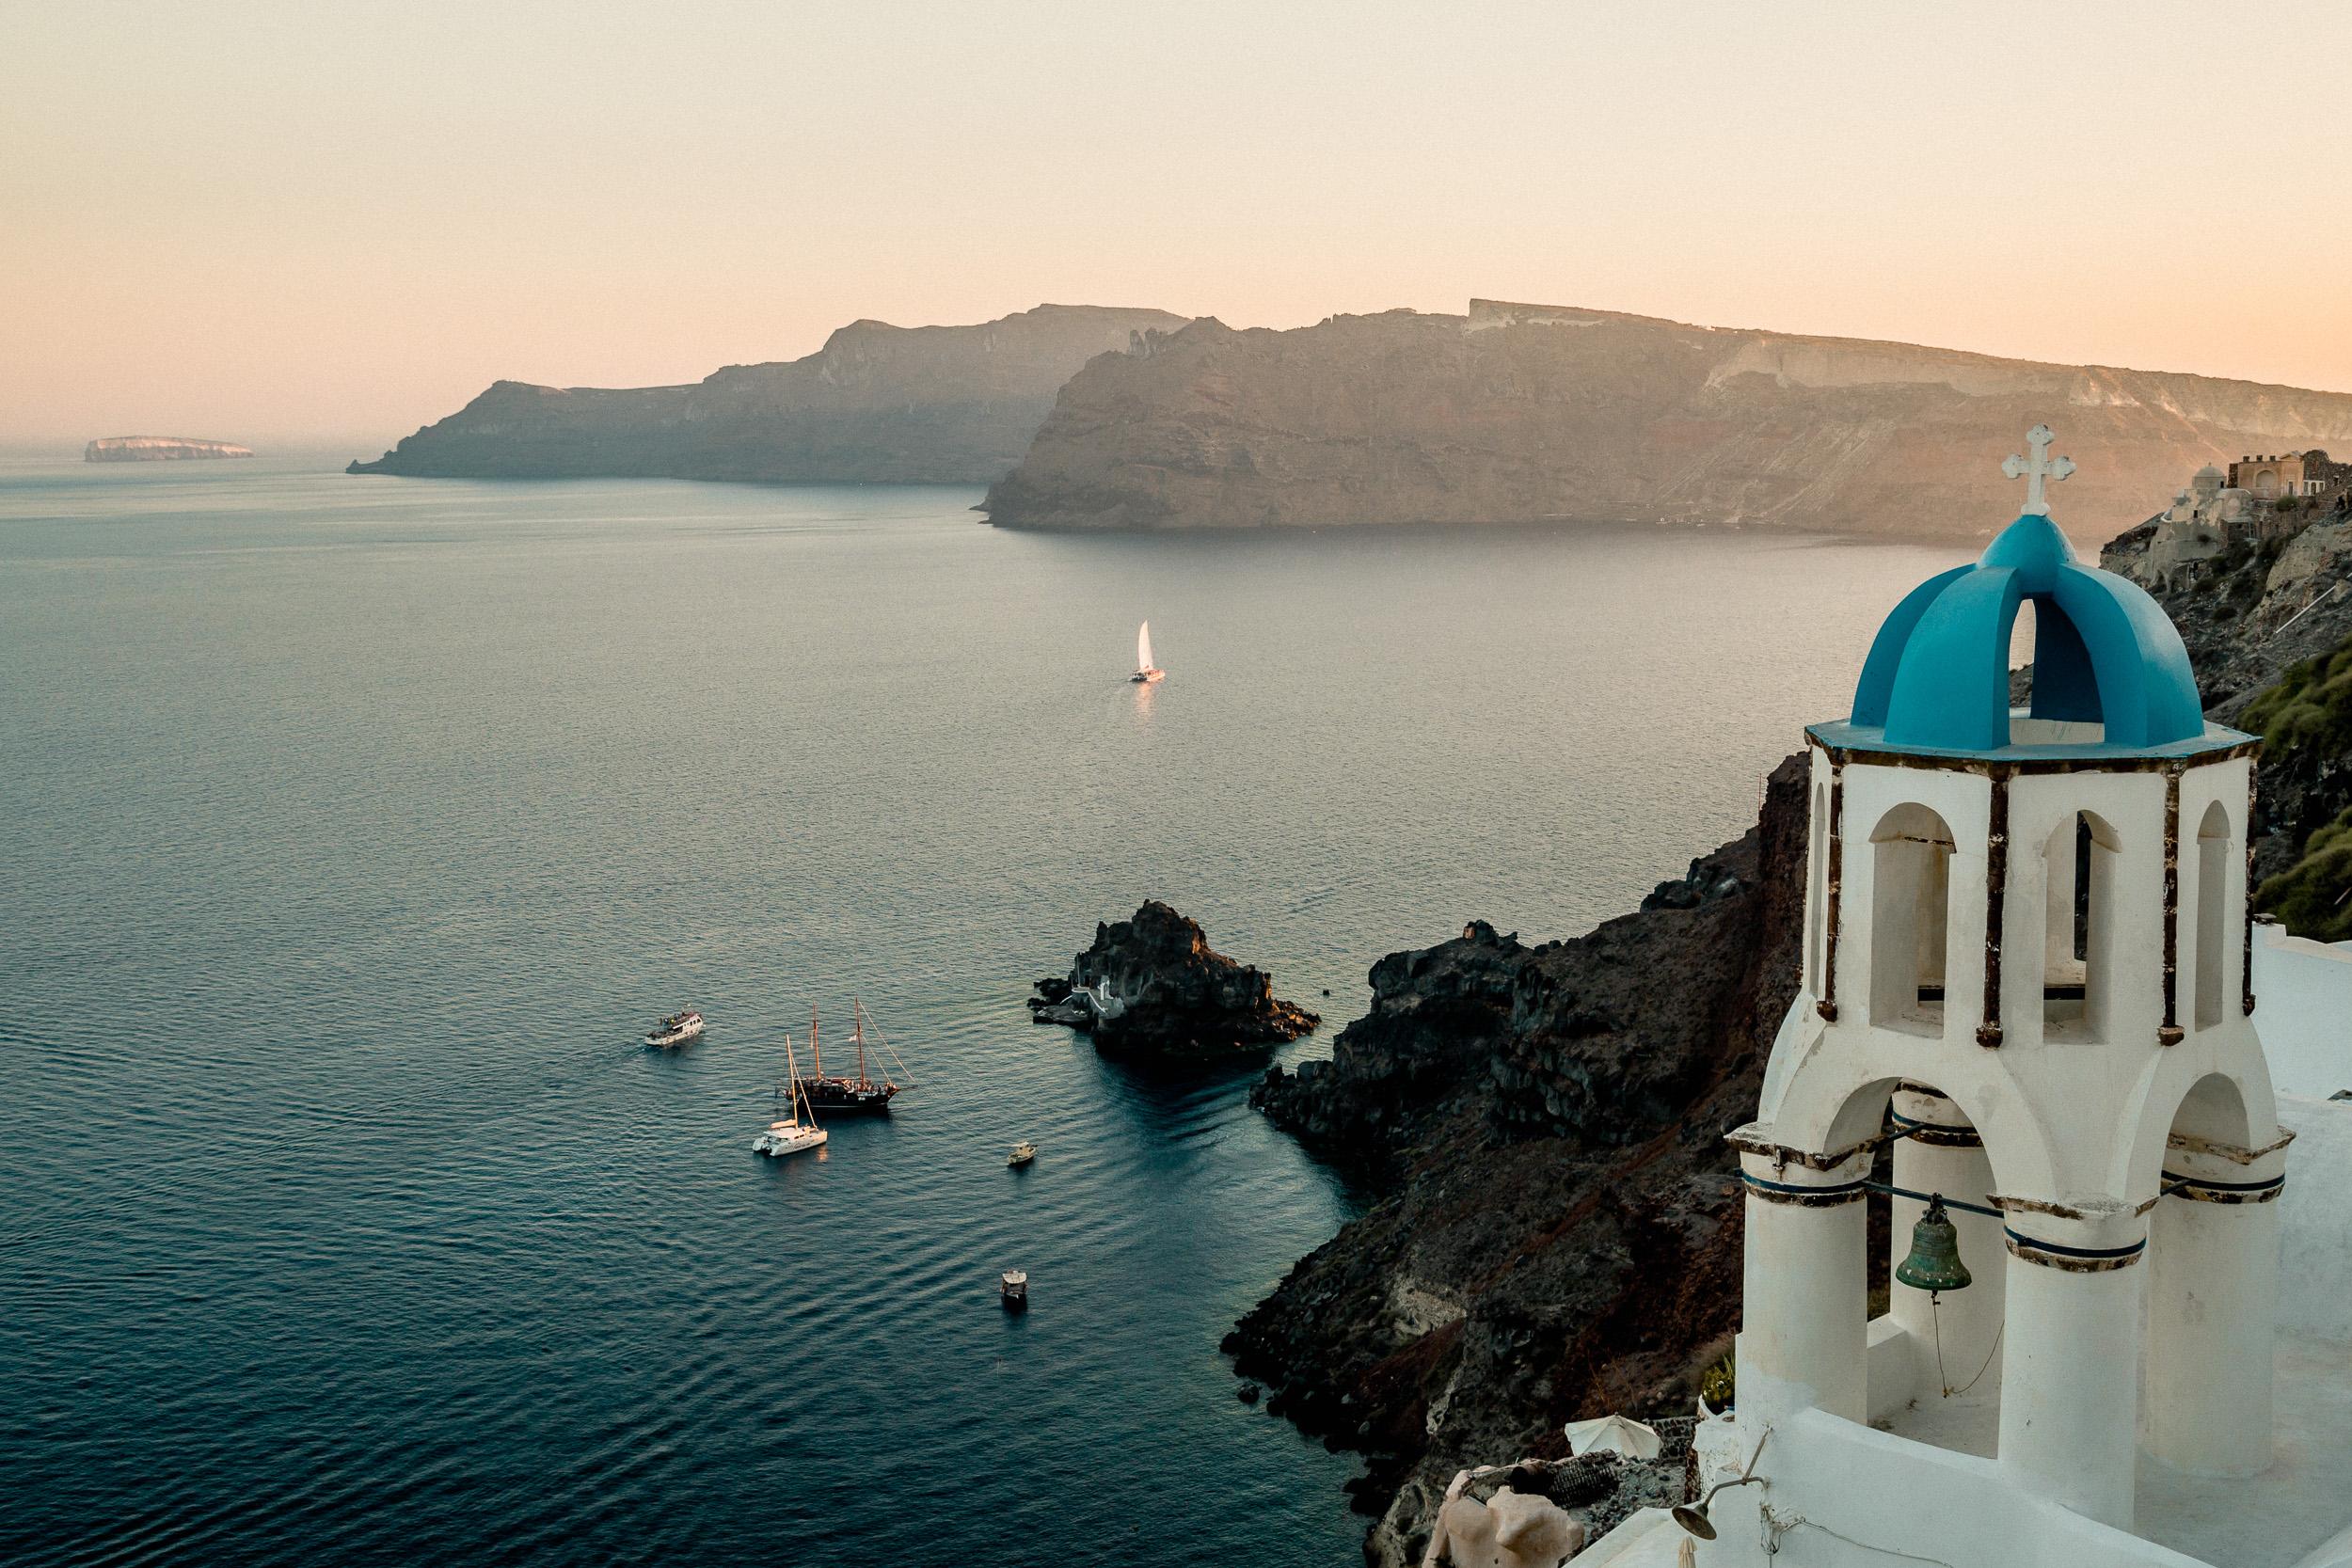 04-santorini-ia-oia-greece-cyclades-crater-sunset-anna-elina-lahti-photographer.jpg